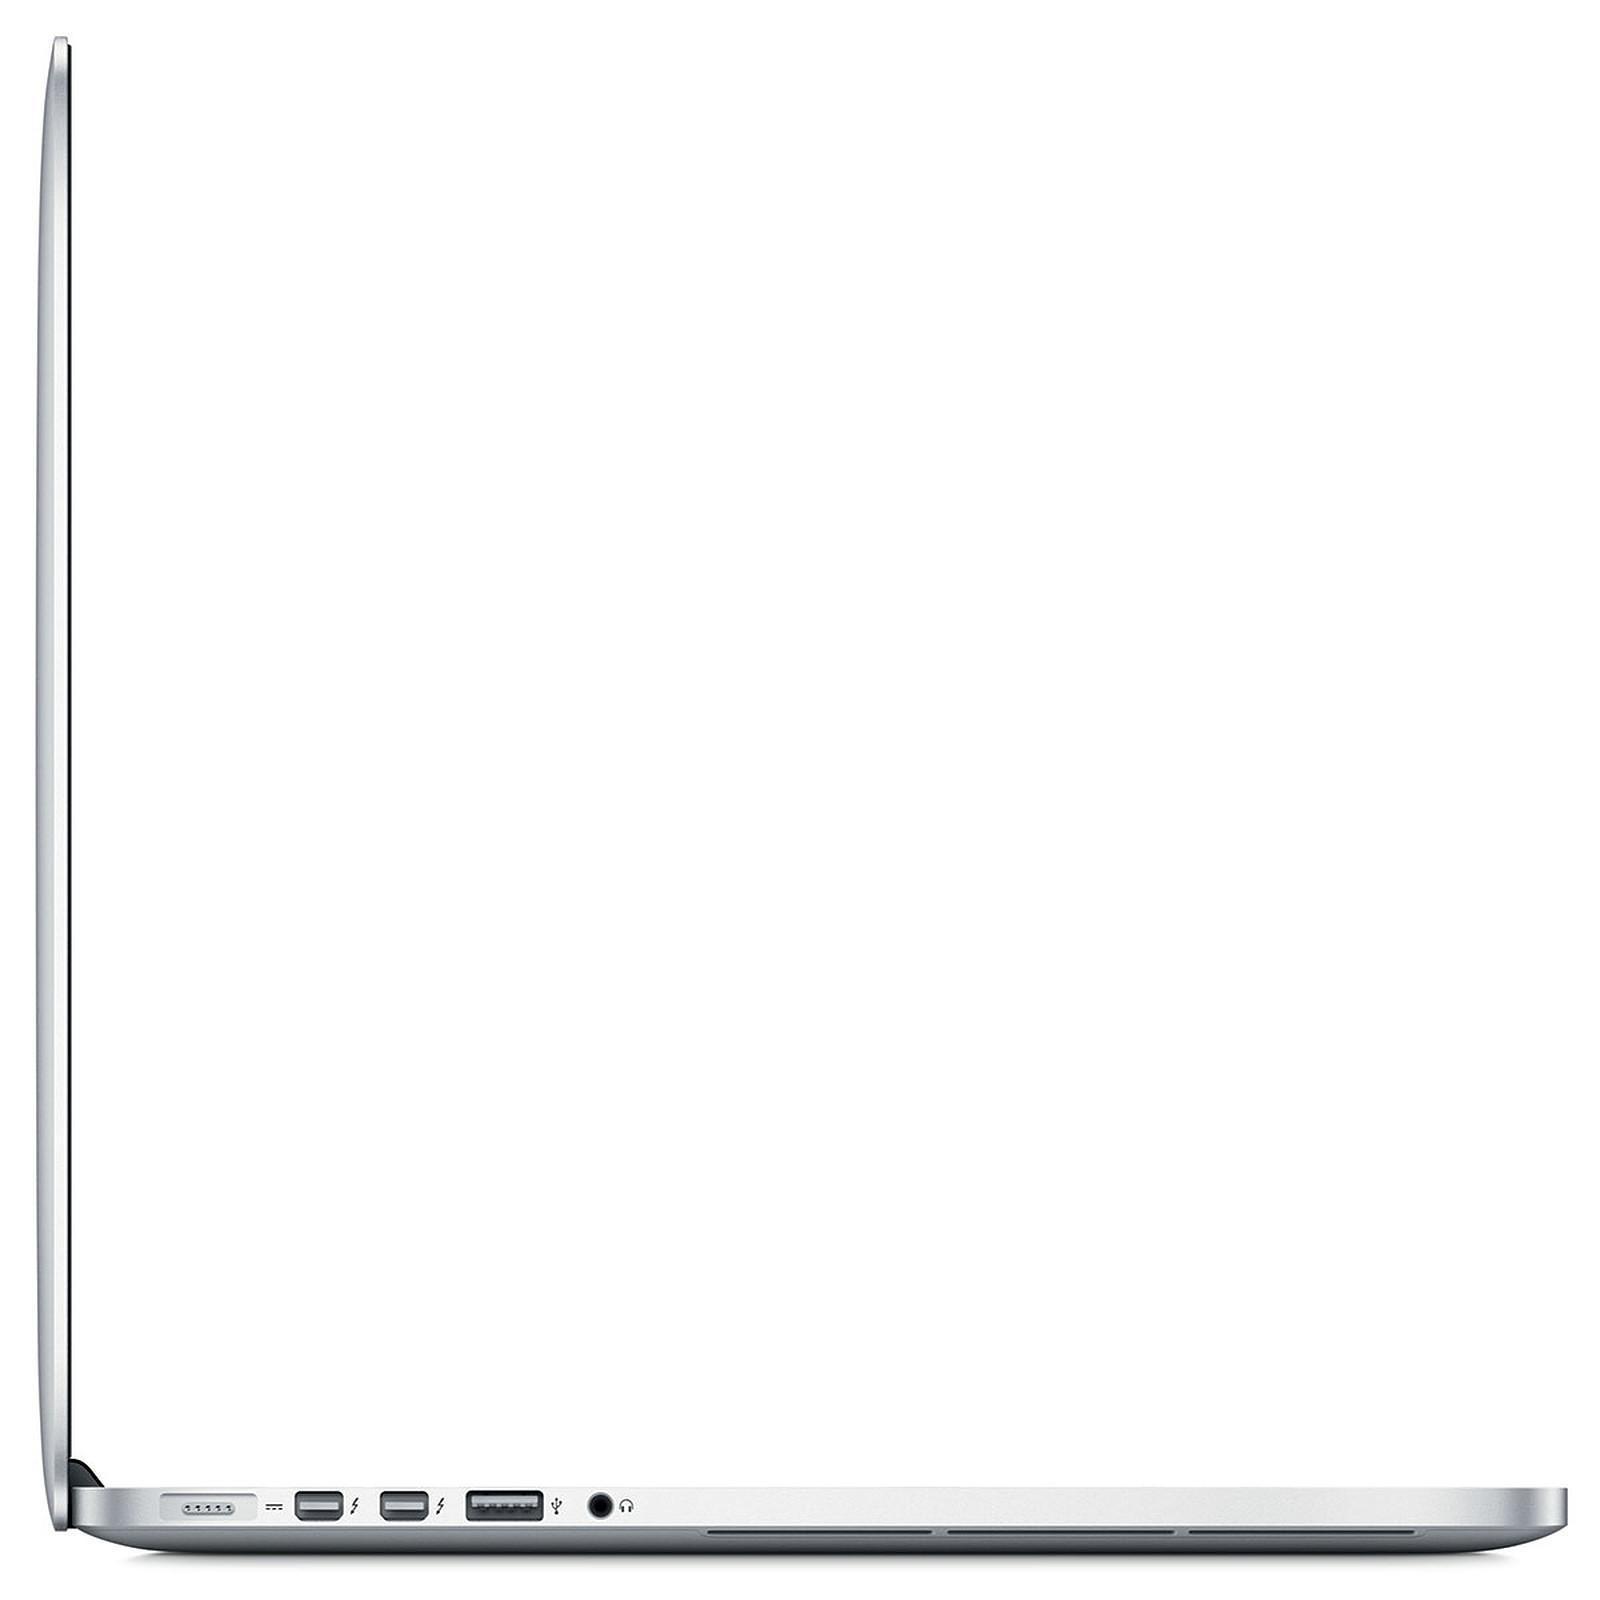 MacBook Pro Retina 15.4-inch (2014) - Core i7 - 16GB - HDD 500 GB